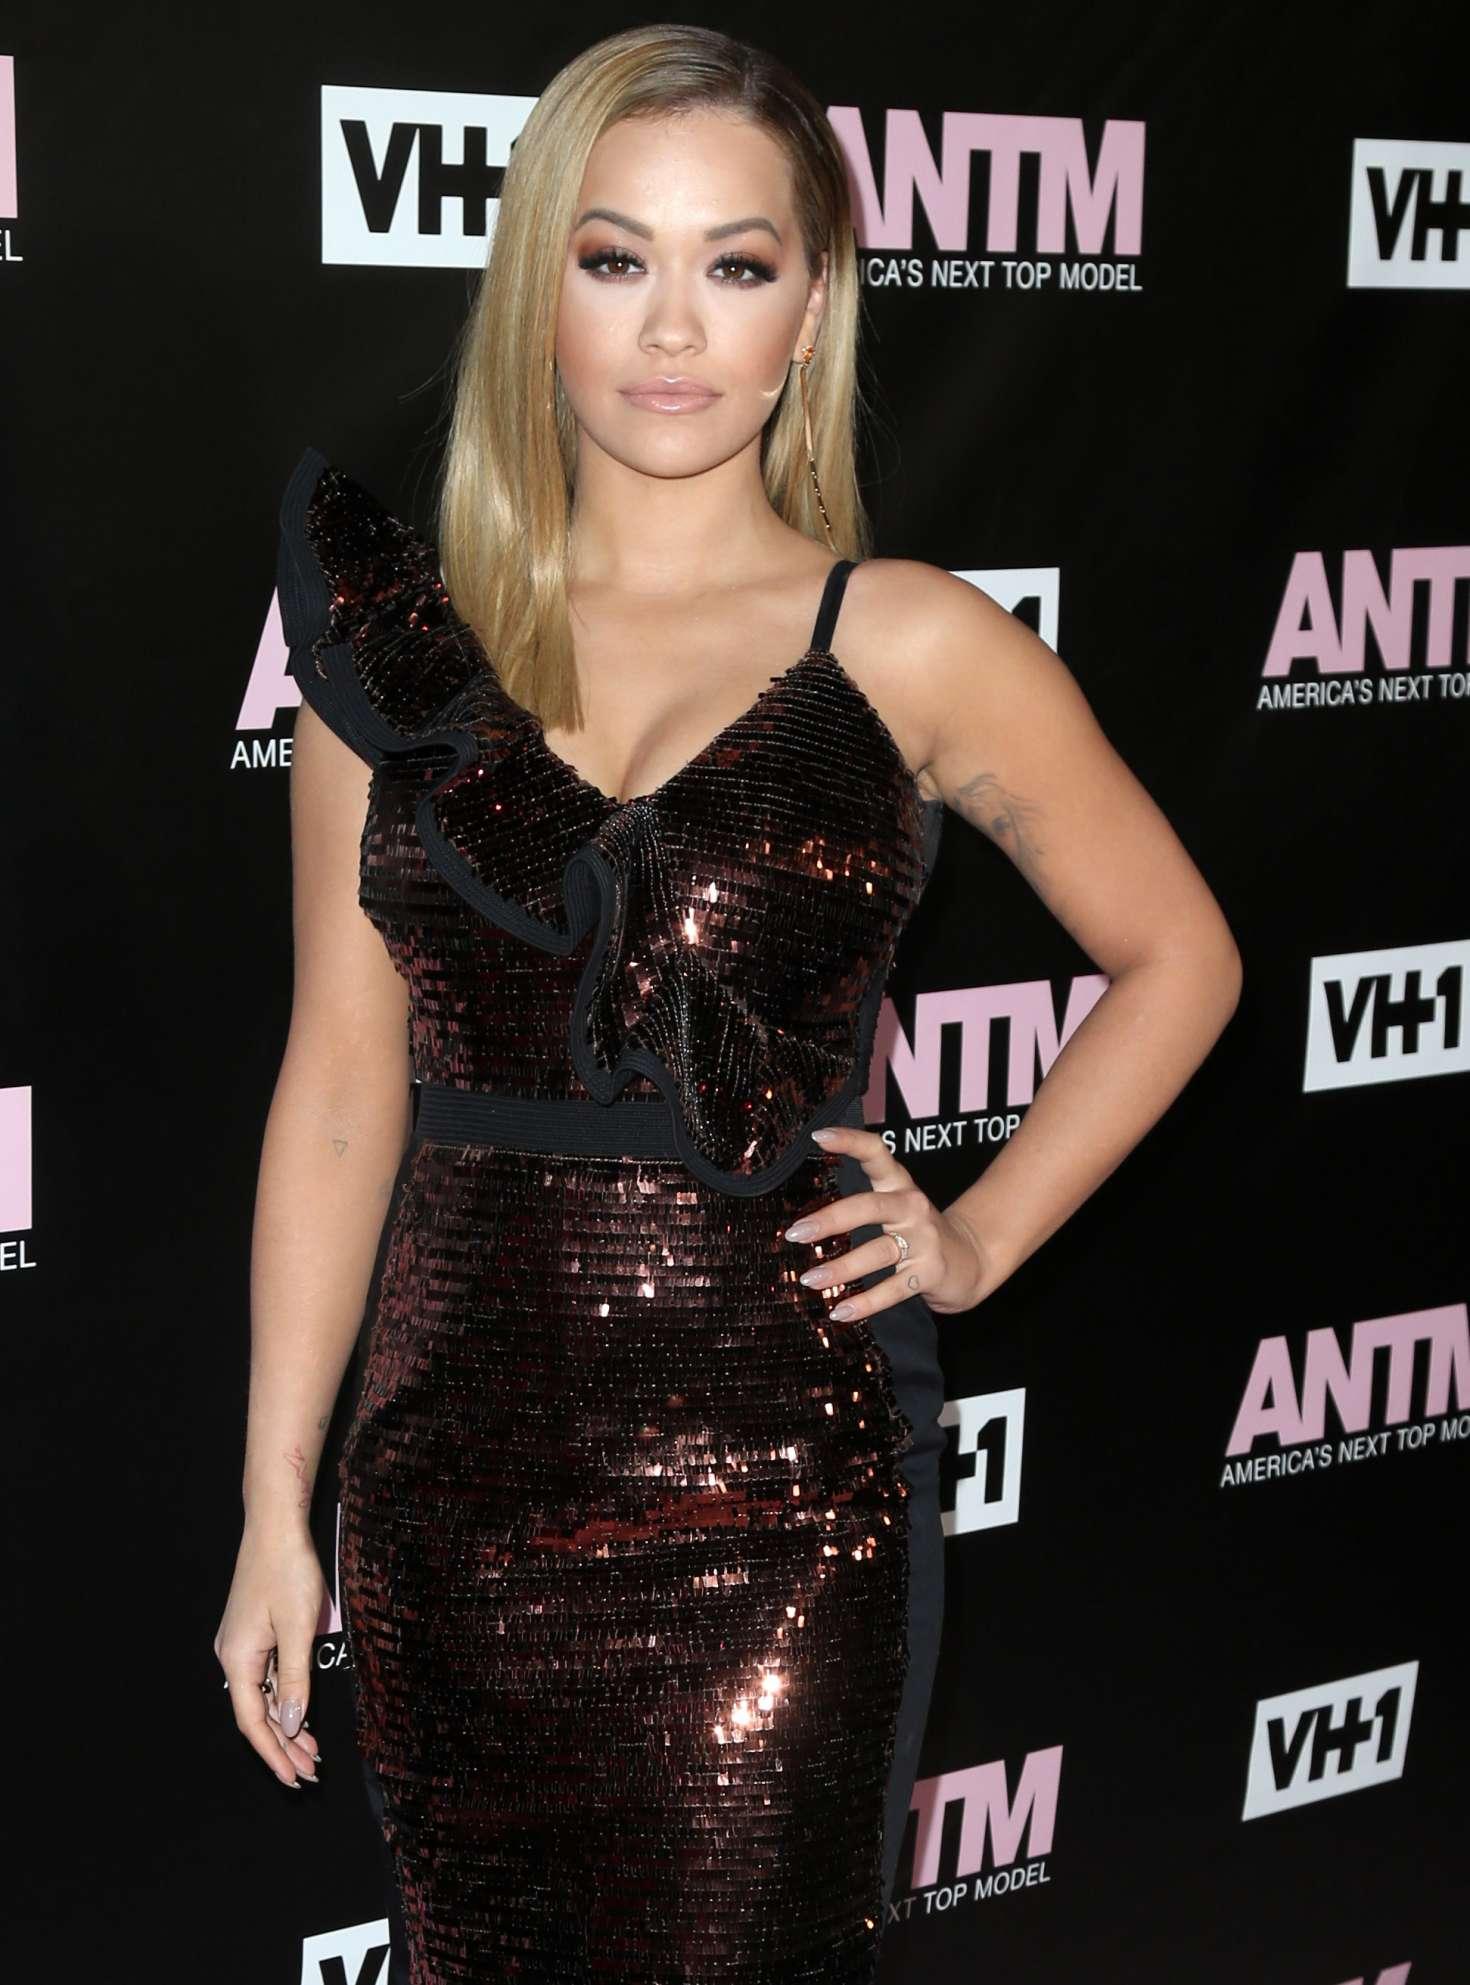 Rita Ora 2016 : Rita Ora: Americas Next Top Model Premiere Party -29